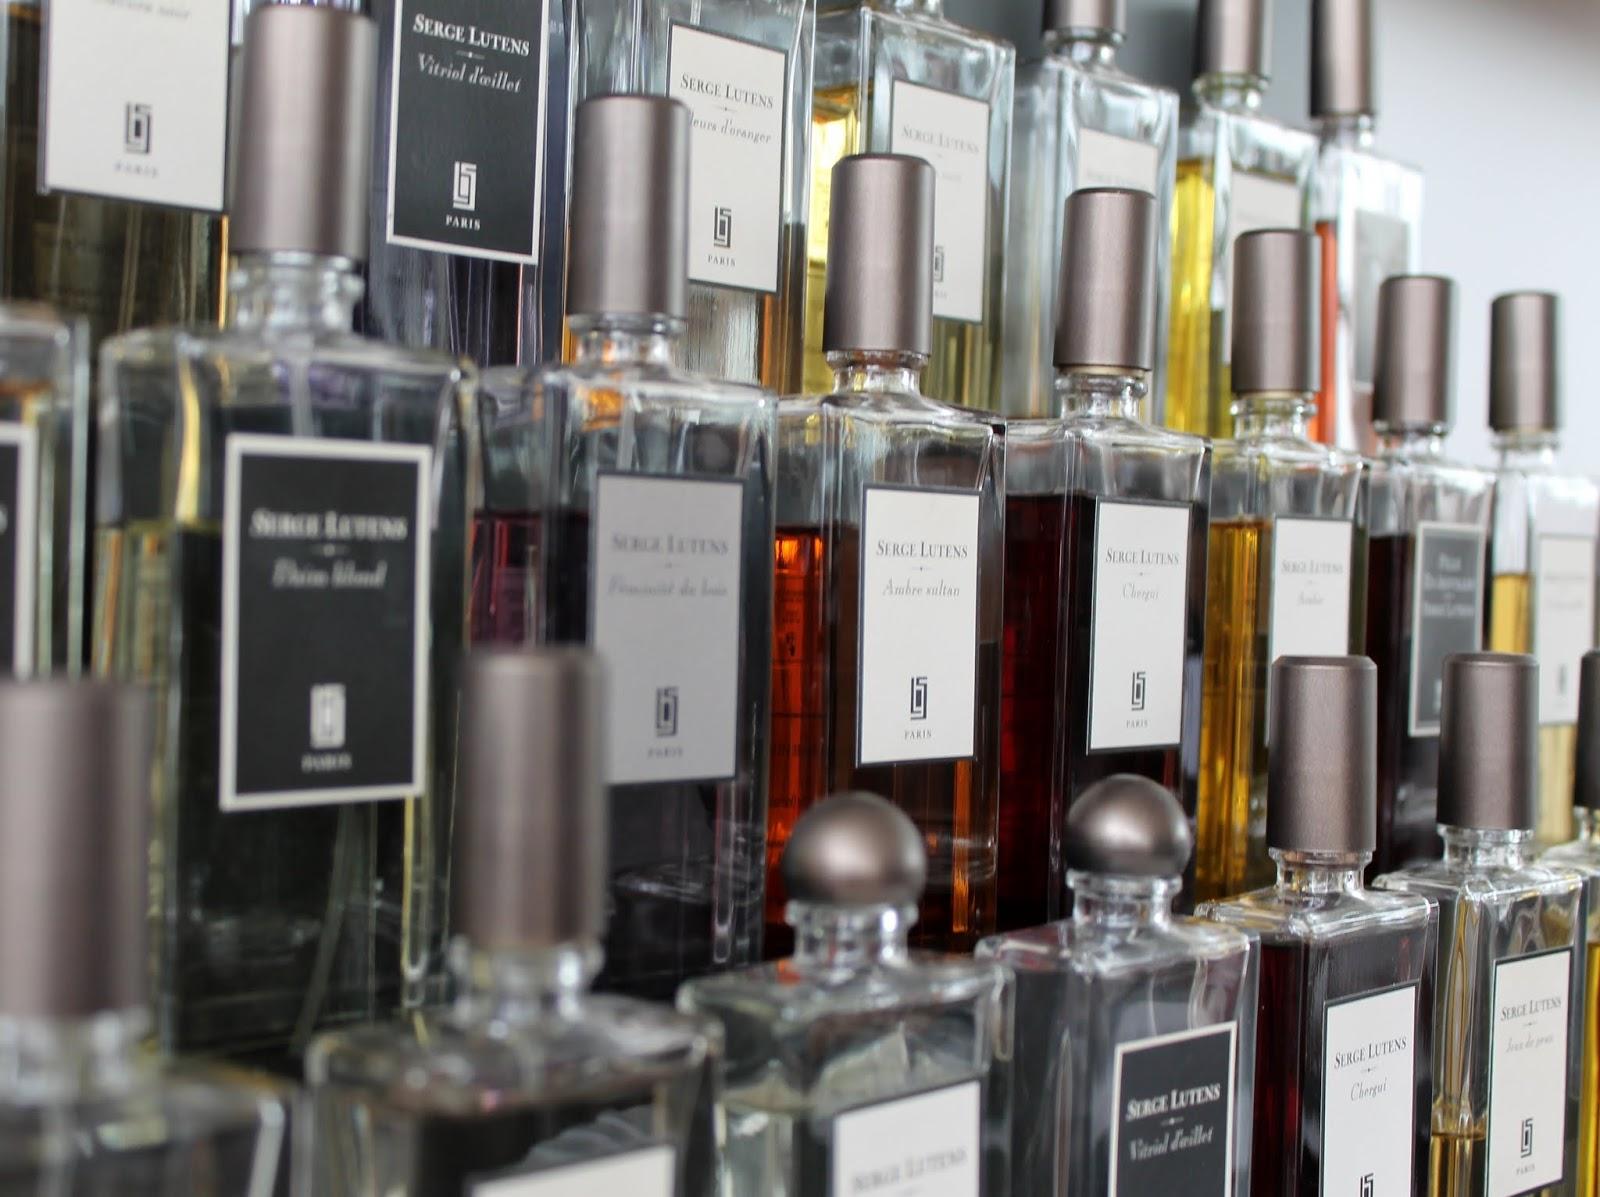 Serge Lutens Parfum Kollektion